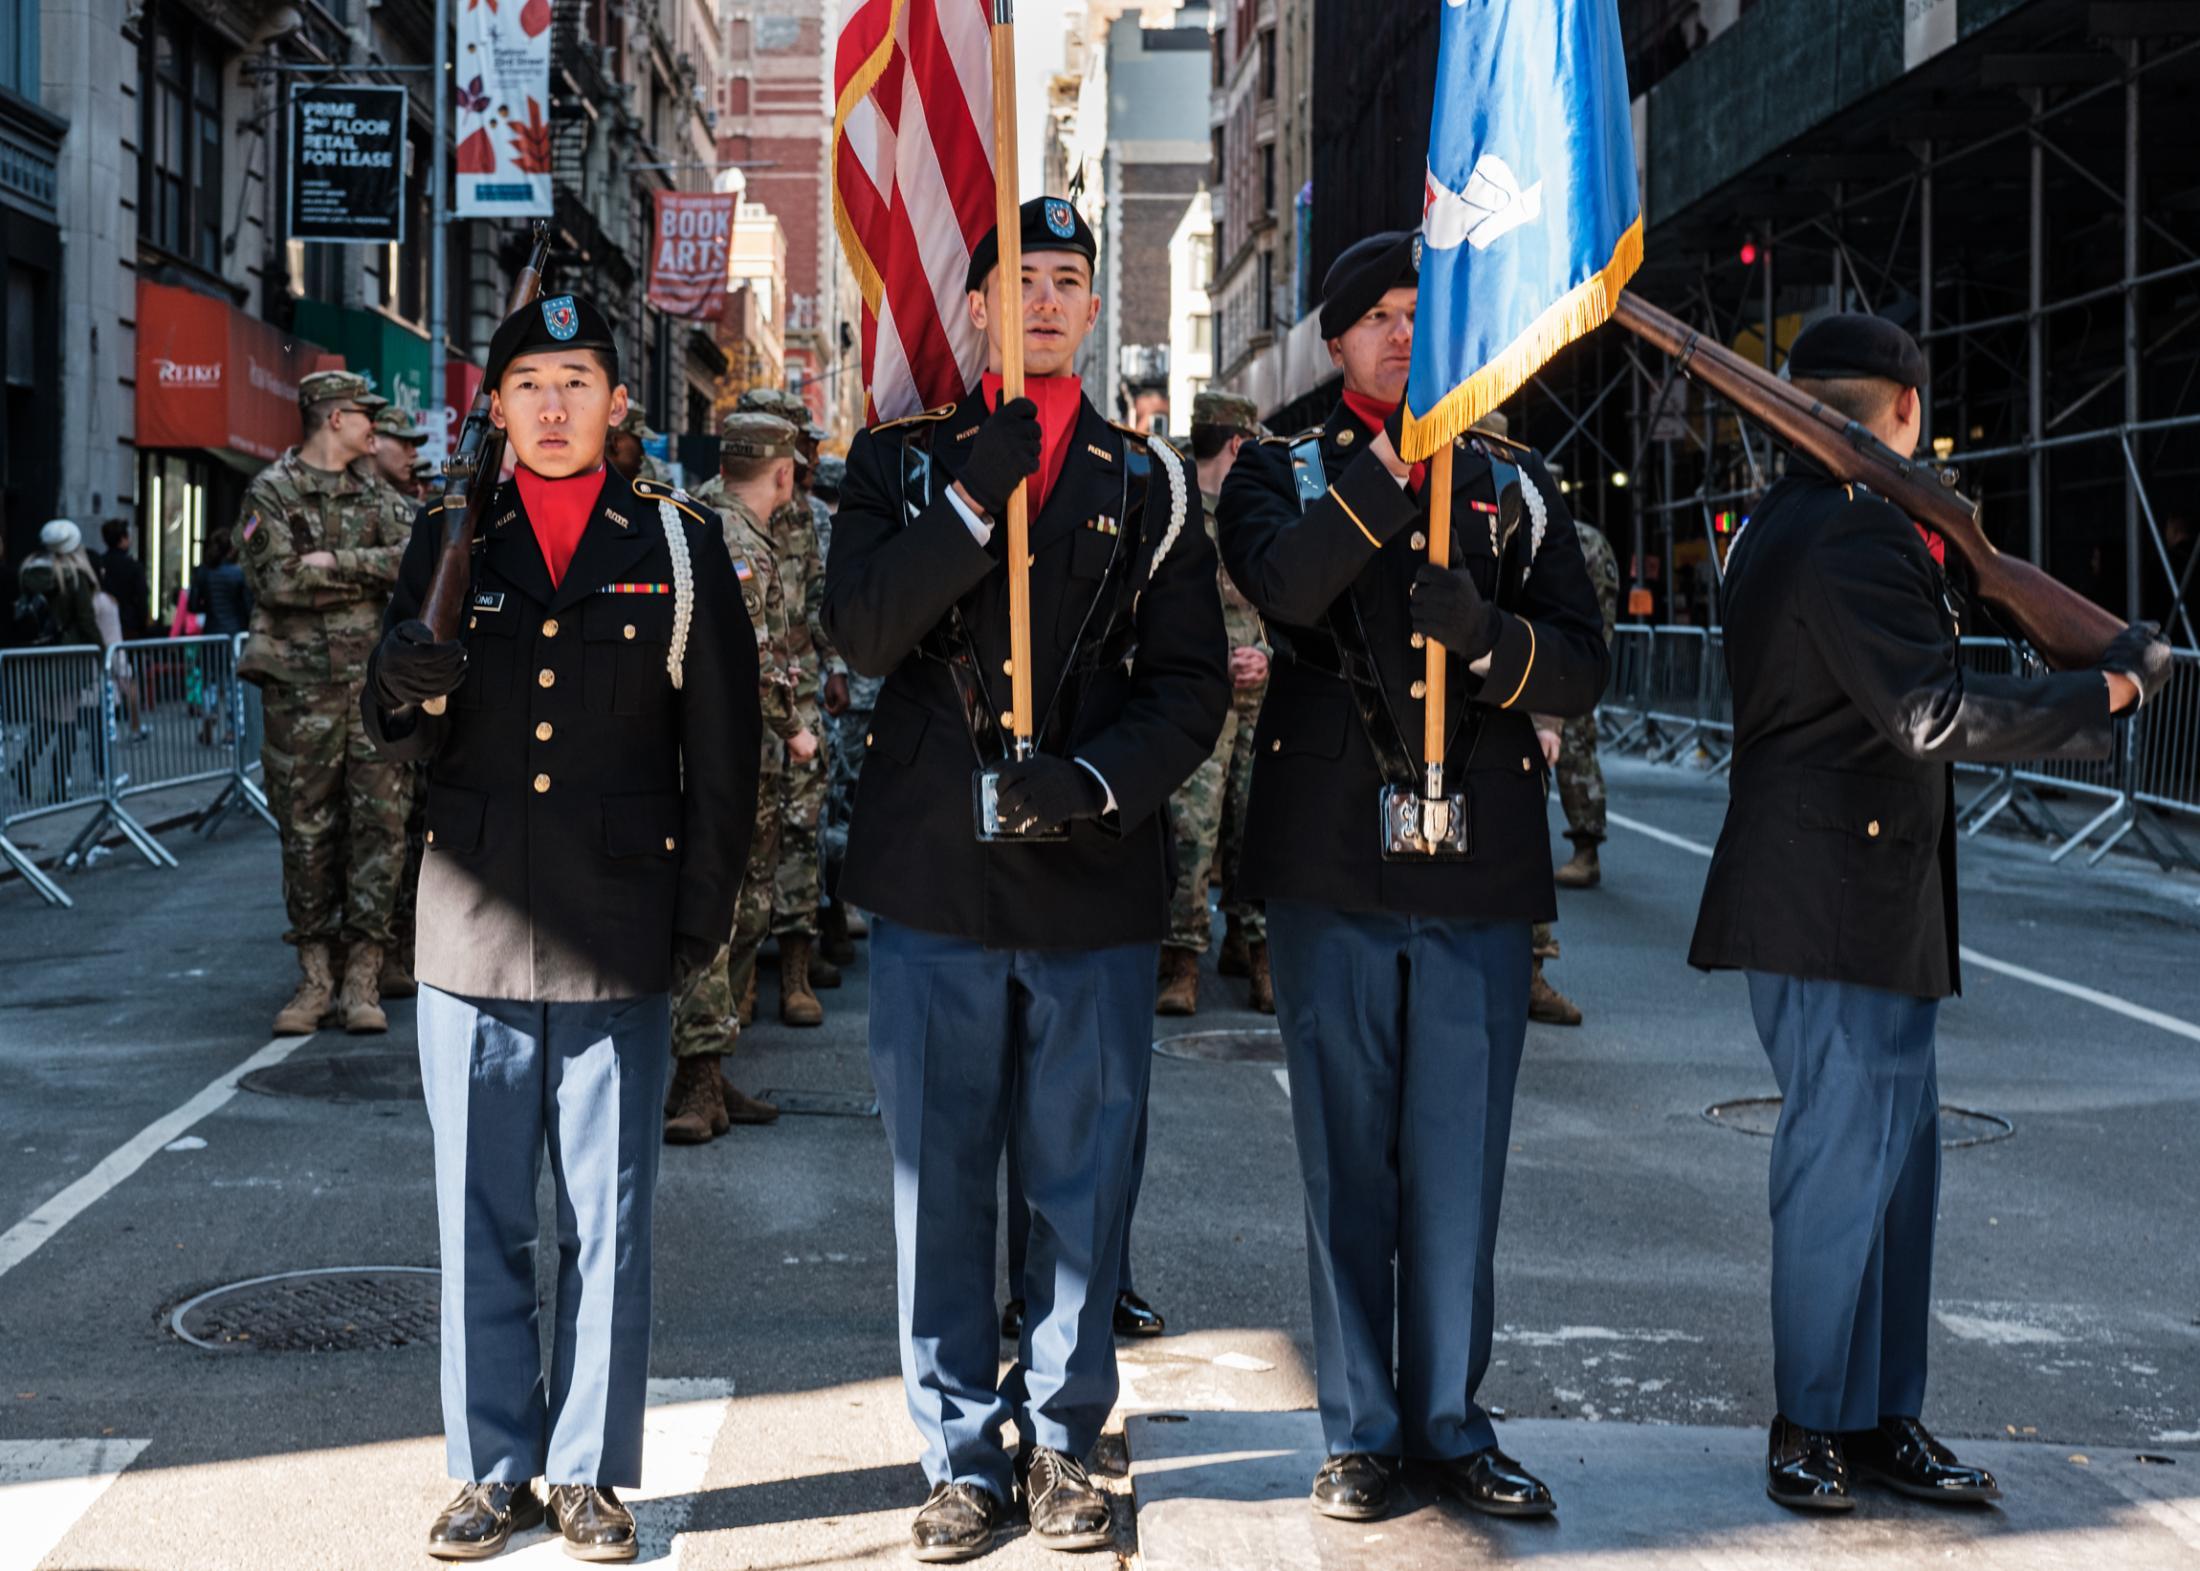 New York City, NY. November 11, 2018. Veteran's Day Parade. Army ROTC Cadets preparing to march. Credit: Andres Guerrero